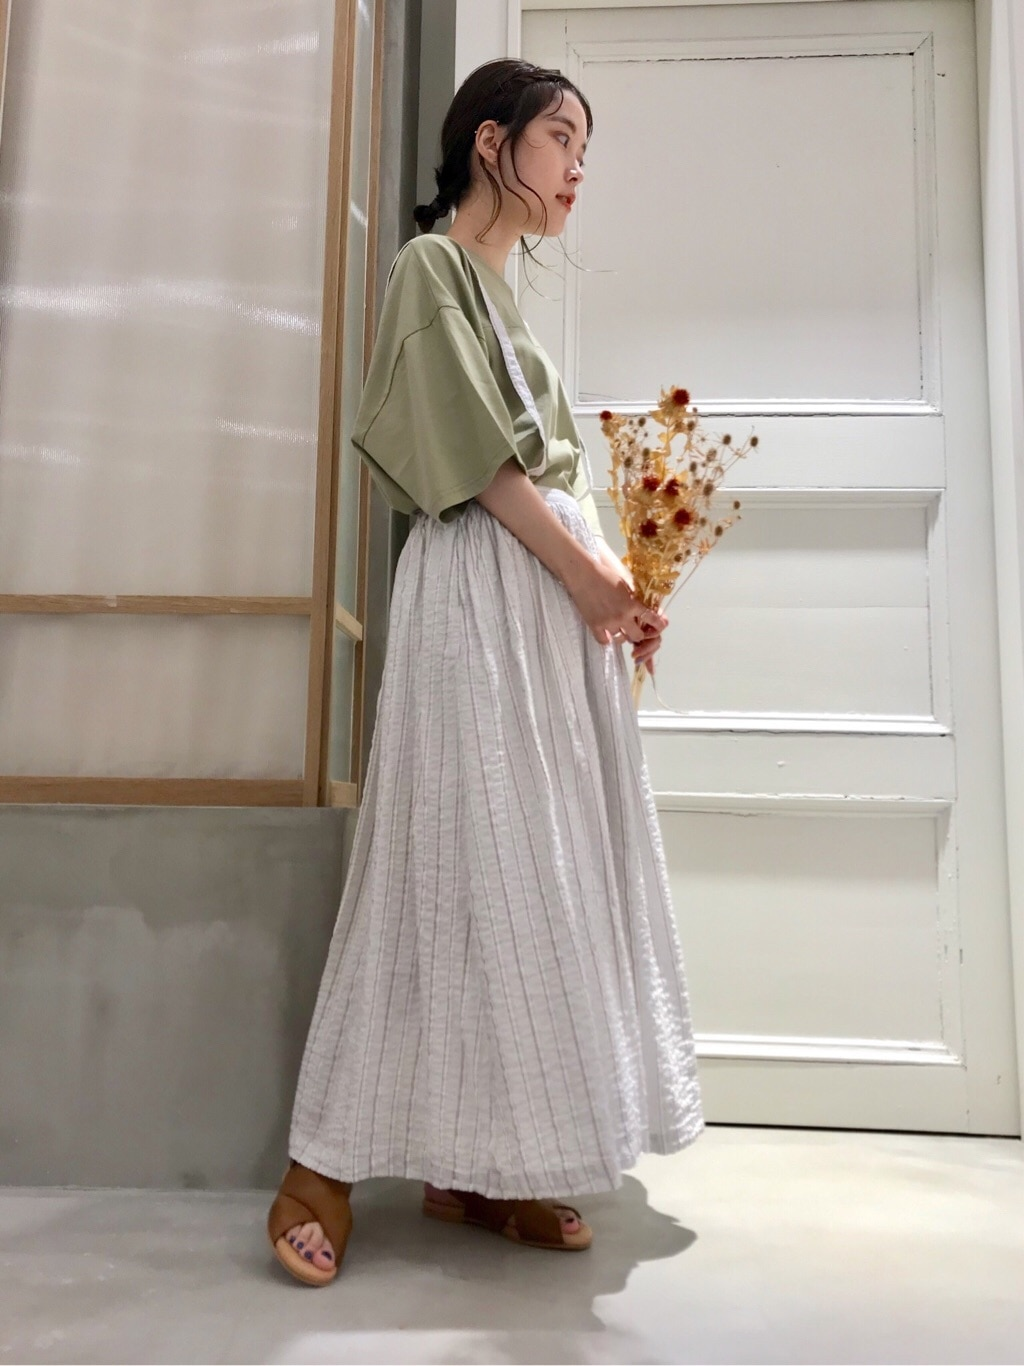 bulle de savon 渋谷スクランブルスクエア 身長:153cm 2020.07.23